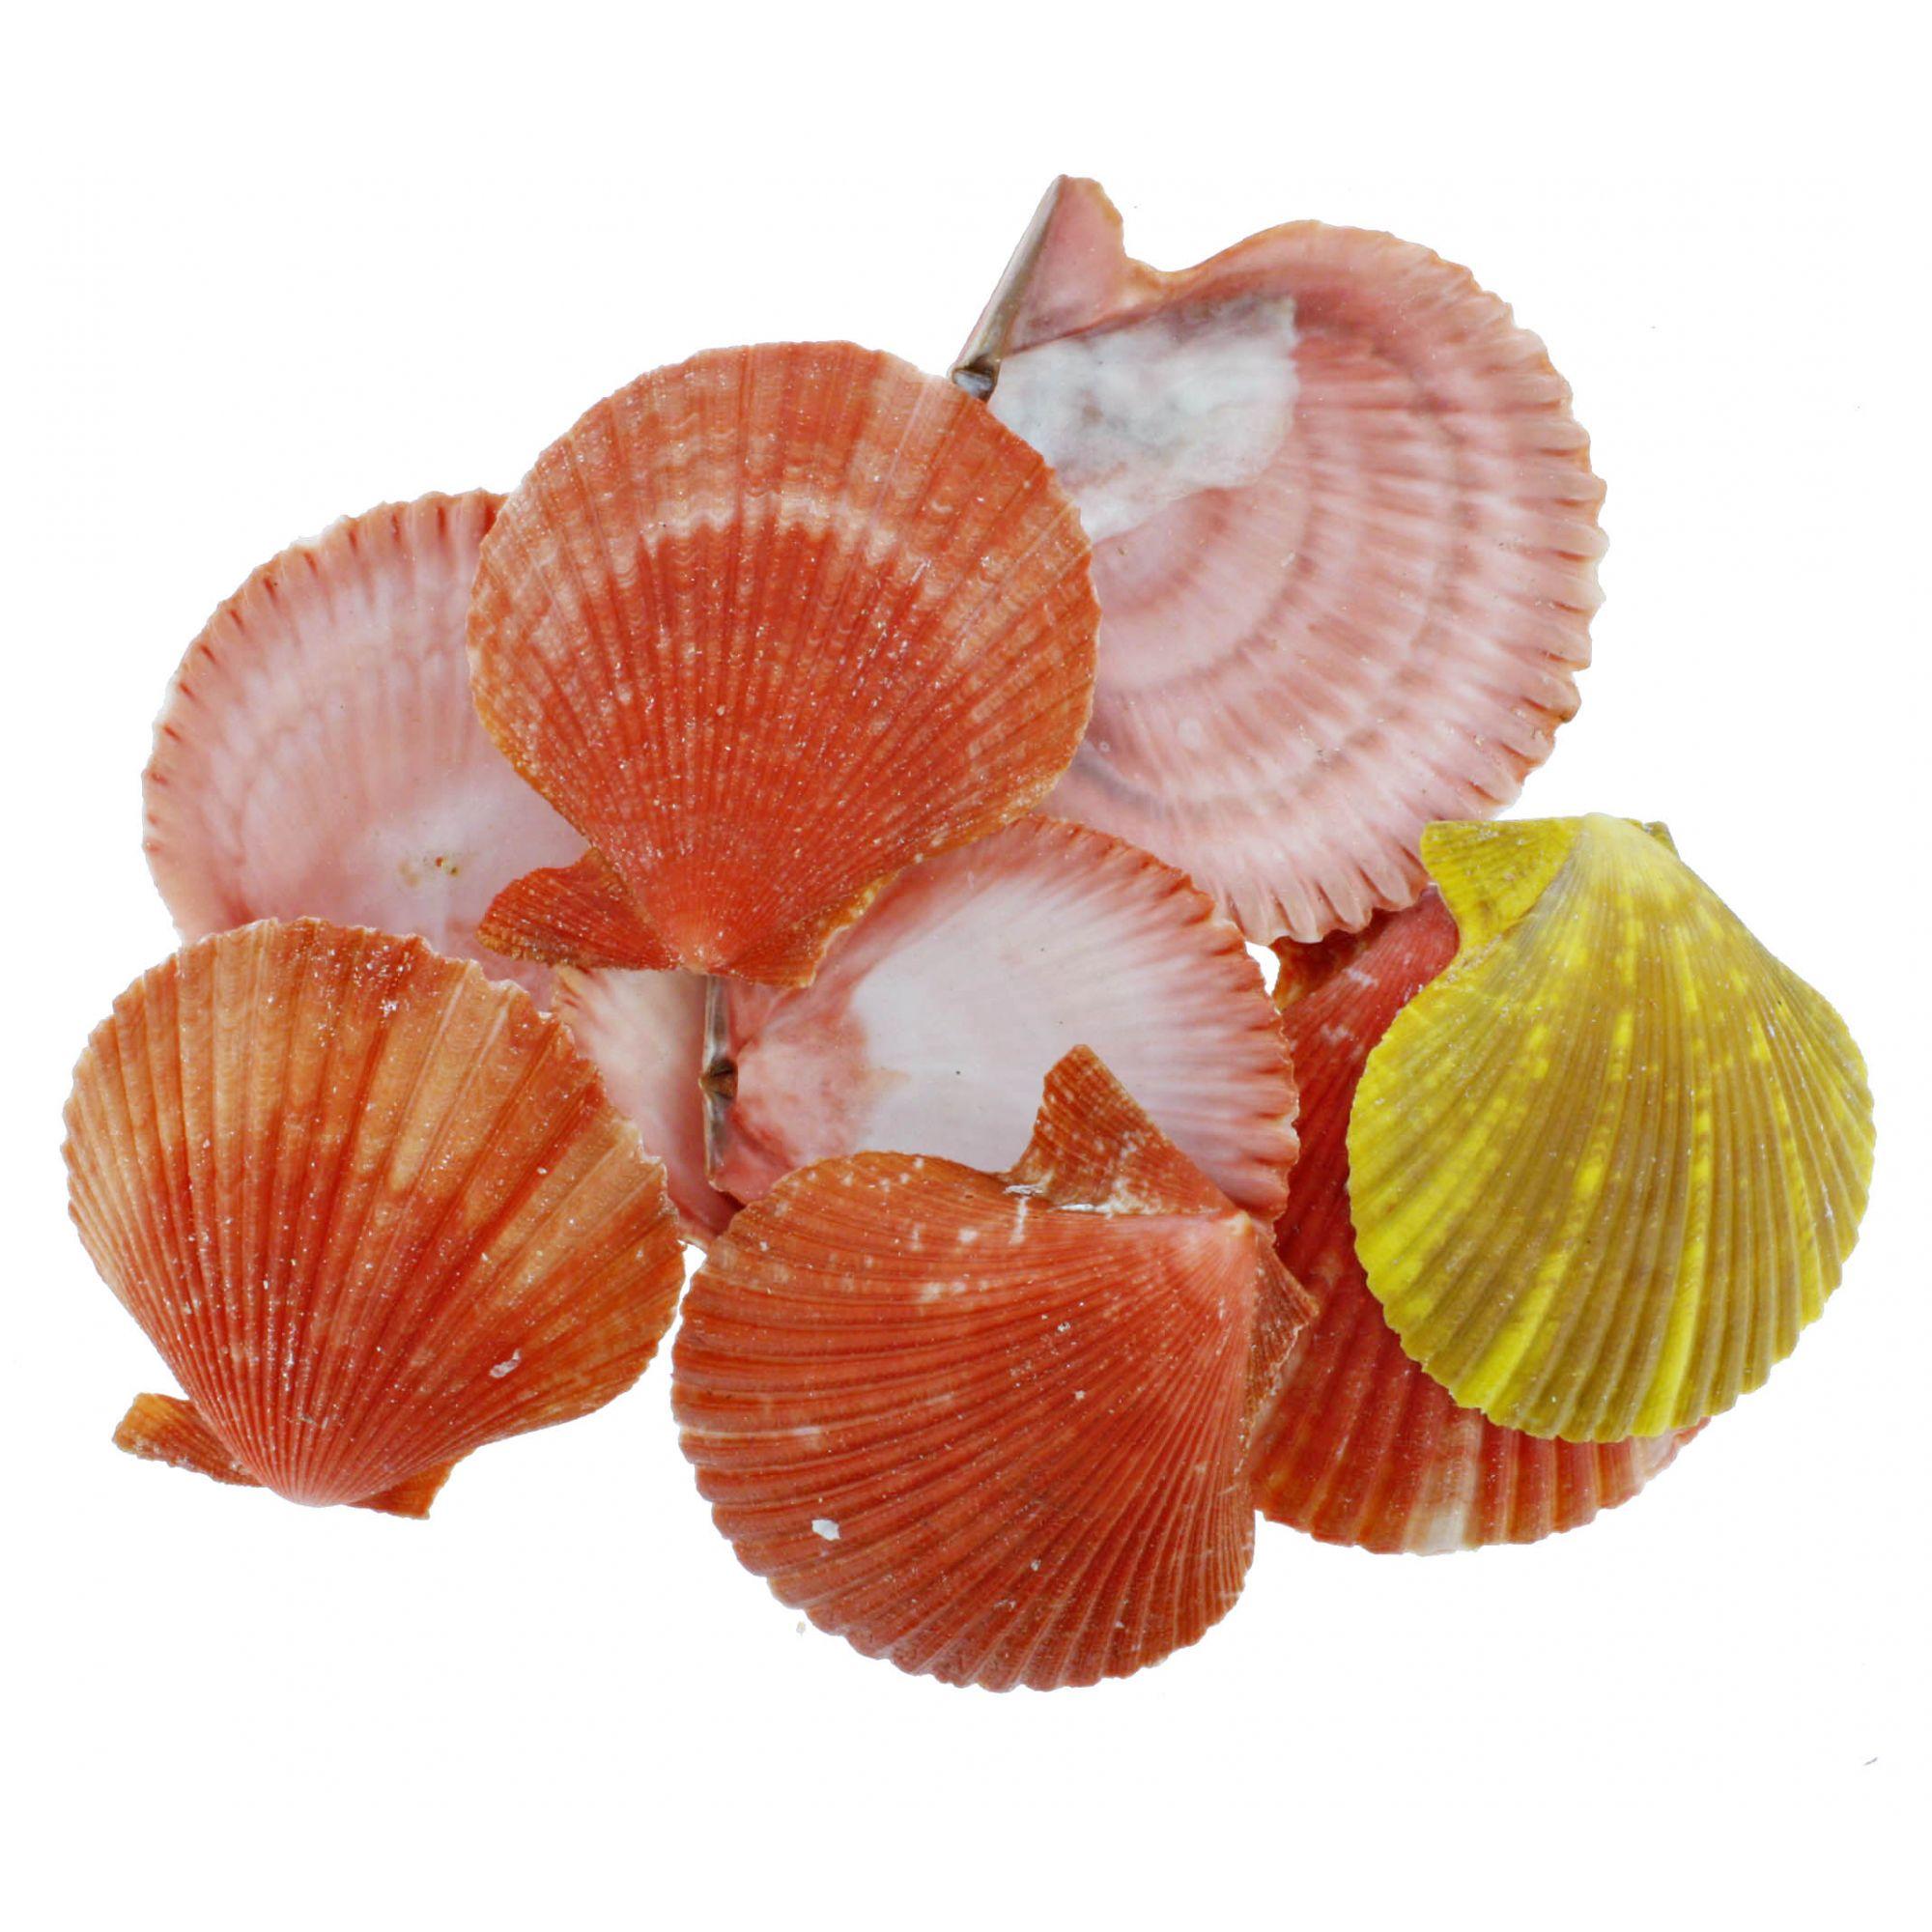 Concha - Pecten Nobilis Colored  - Stéphanie Bijoux® - Peças para Bijuterias e Artesanato